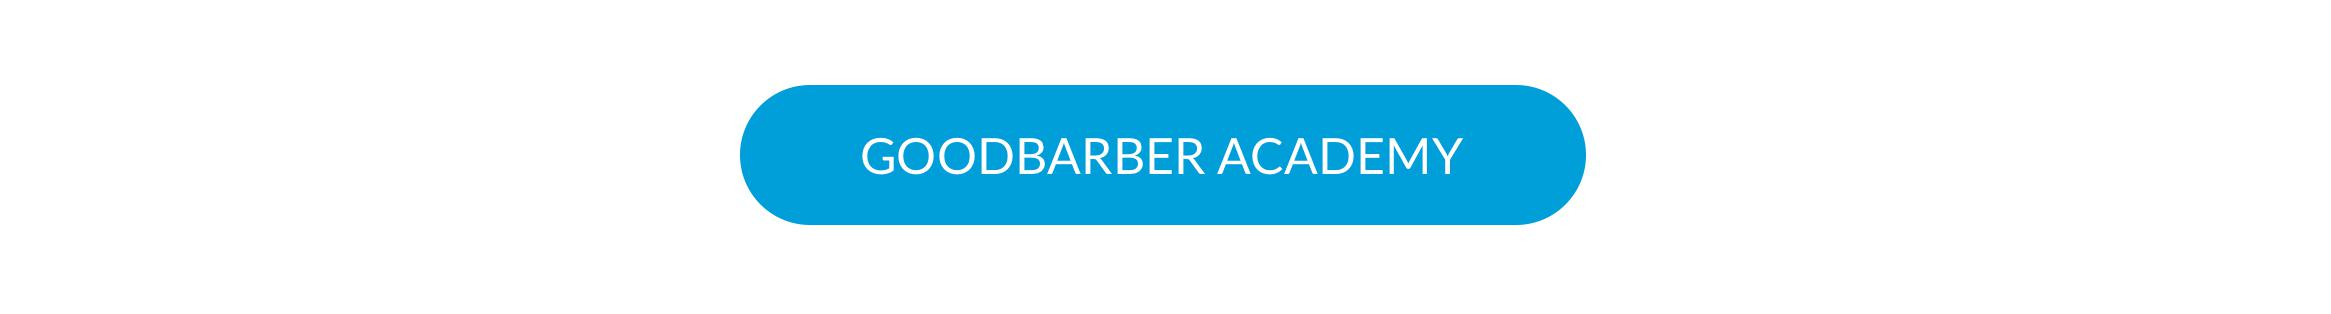 Bienvenue à la GoodBarber Academy !